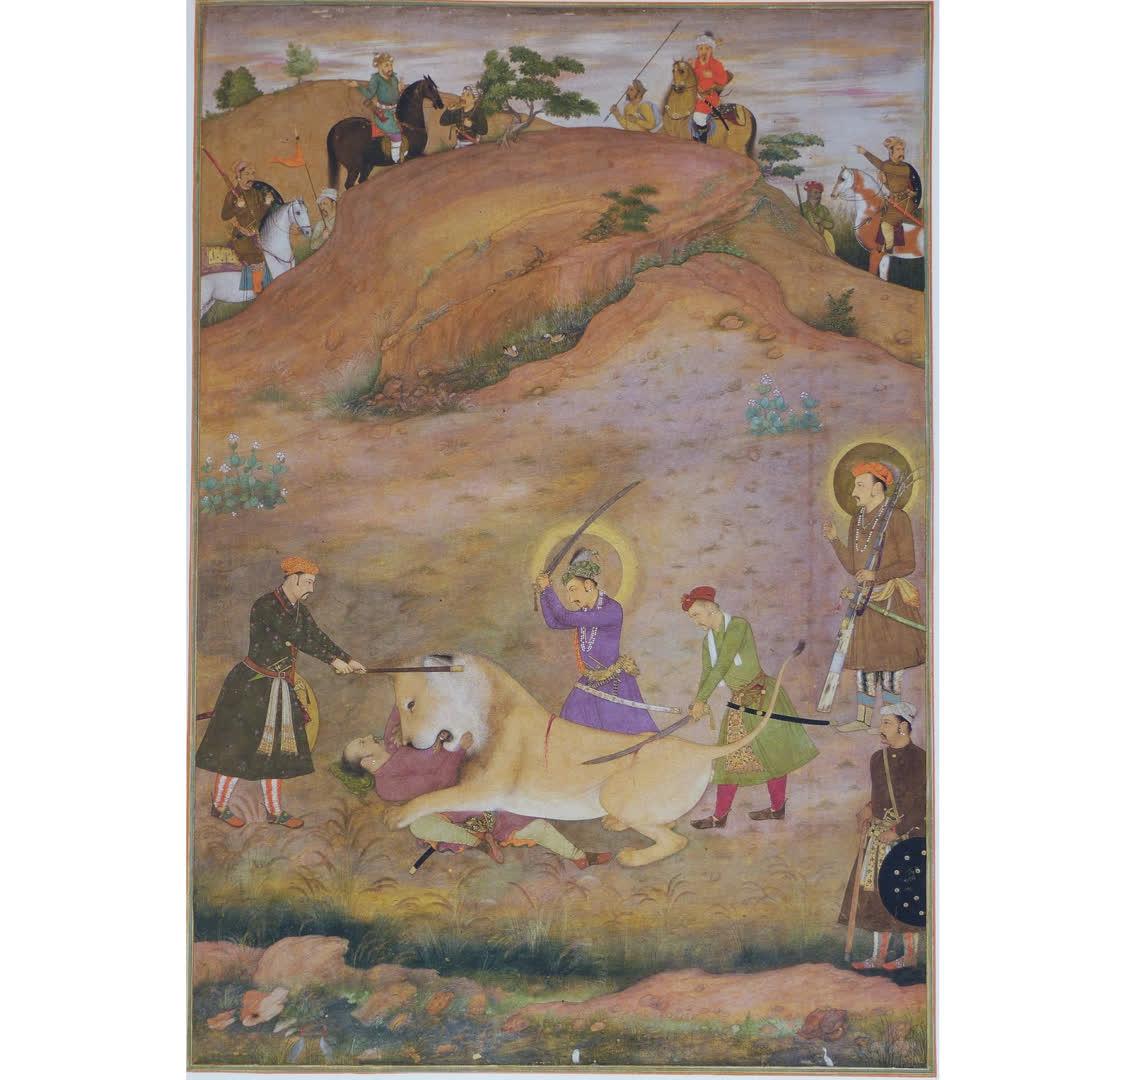 Prince Khurram (later Shah Jahan) killing a lion who attacked Anup Singh Badgujar, a Rajput noble. Folio from Padshahanama.